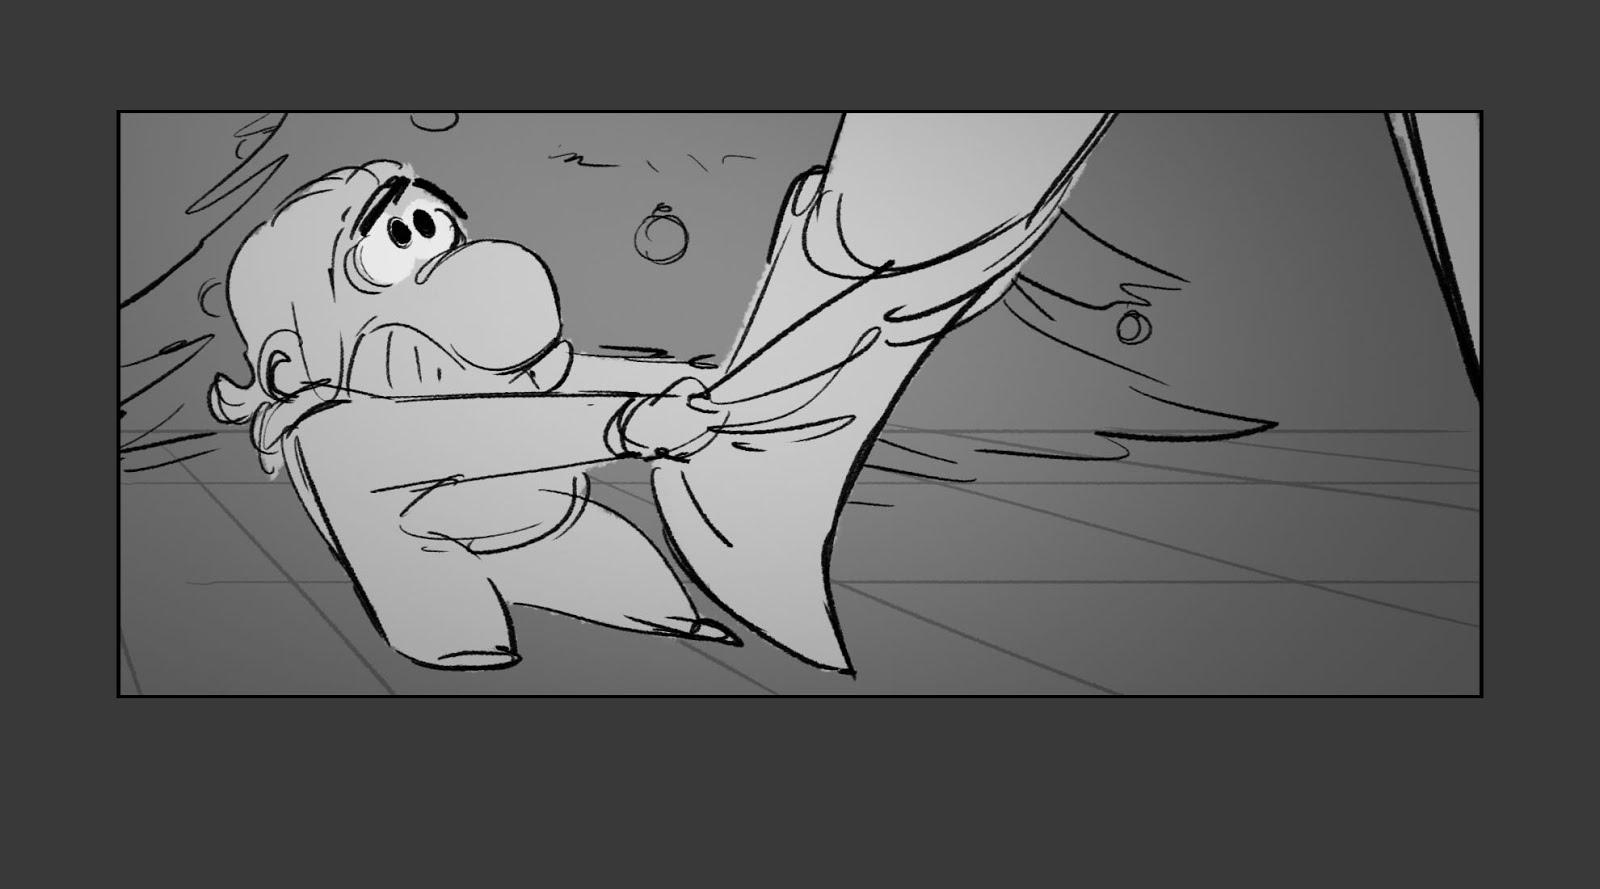 Storyboard #1